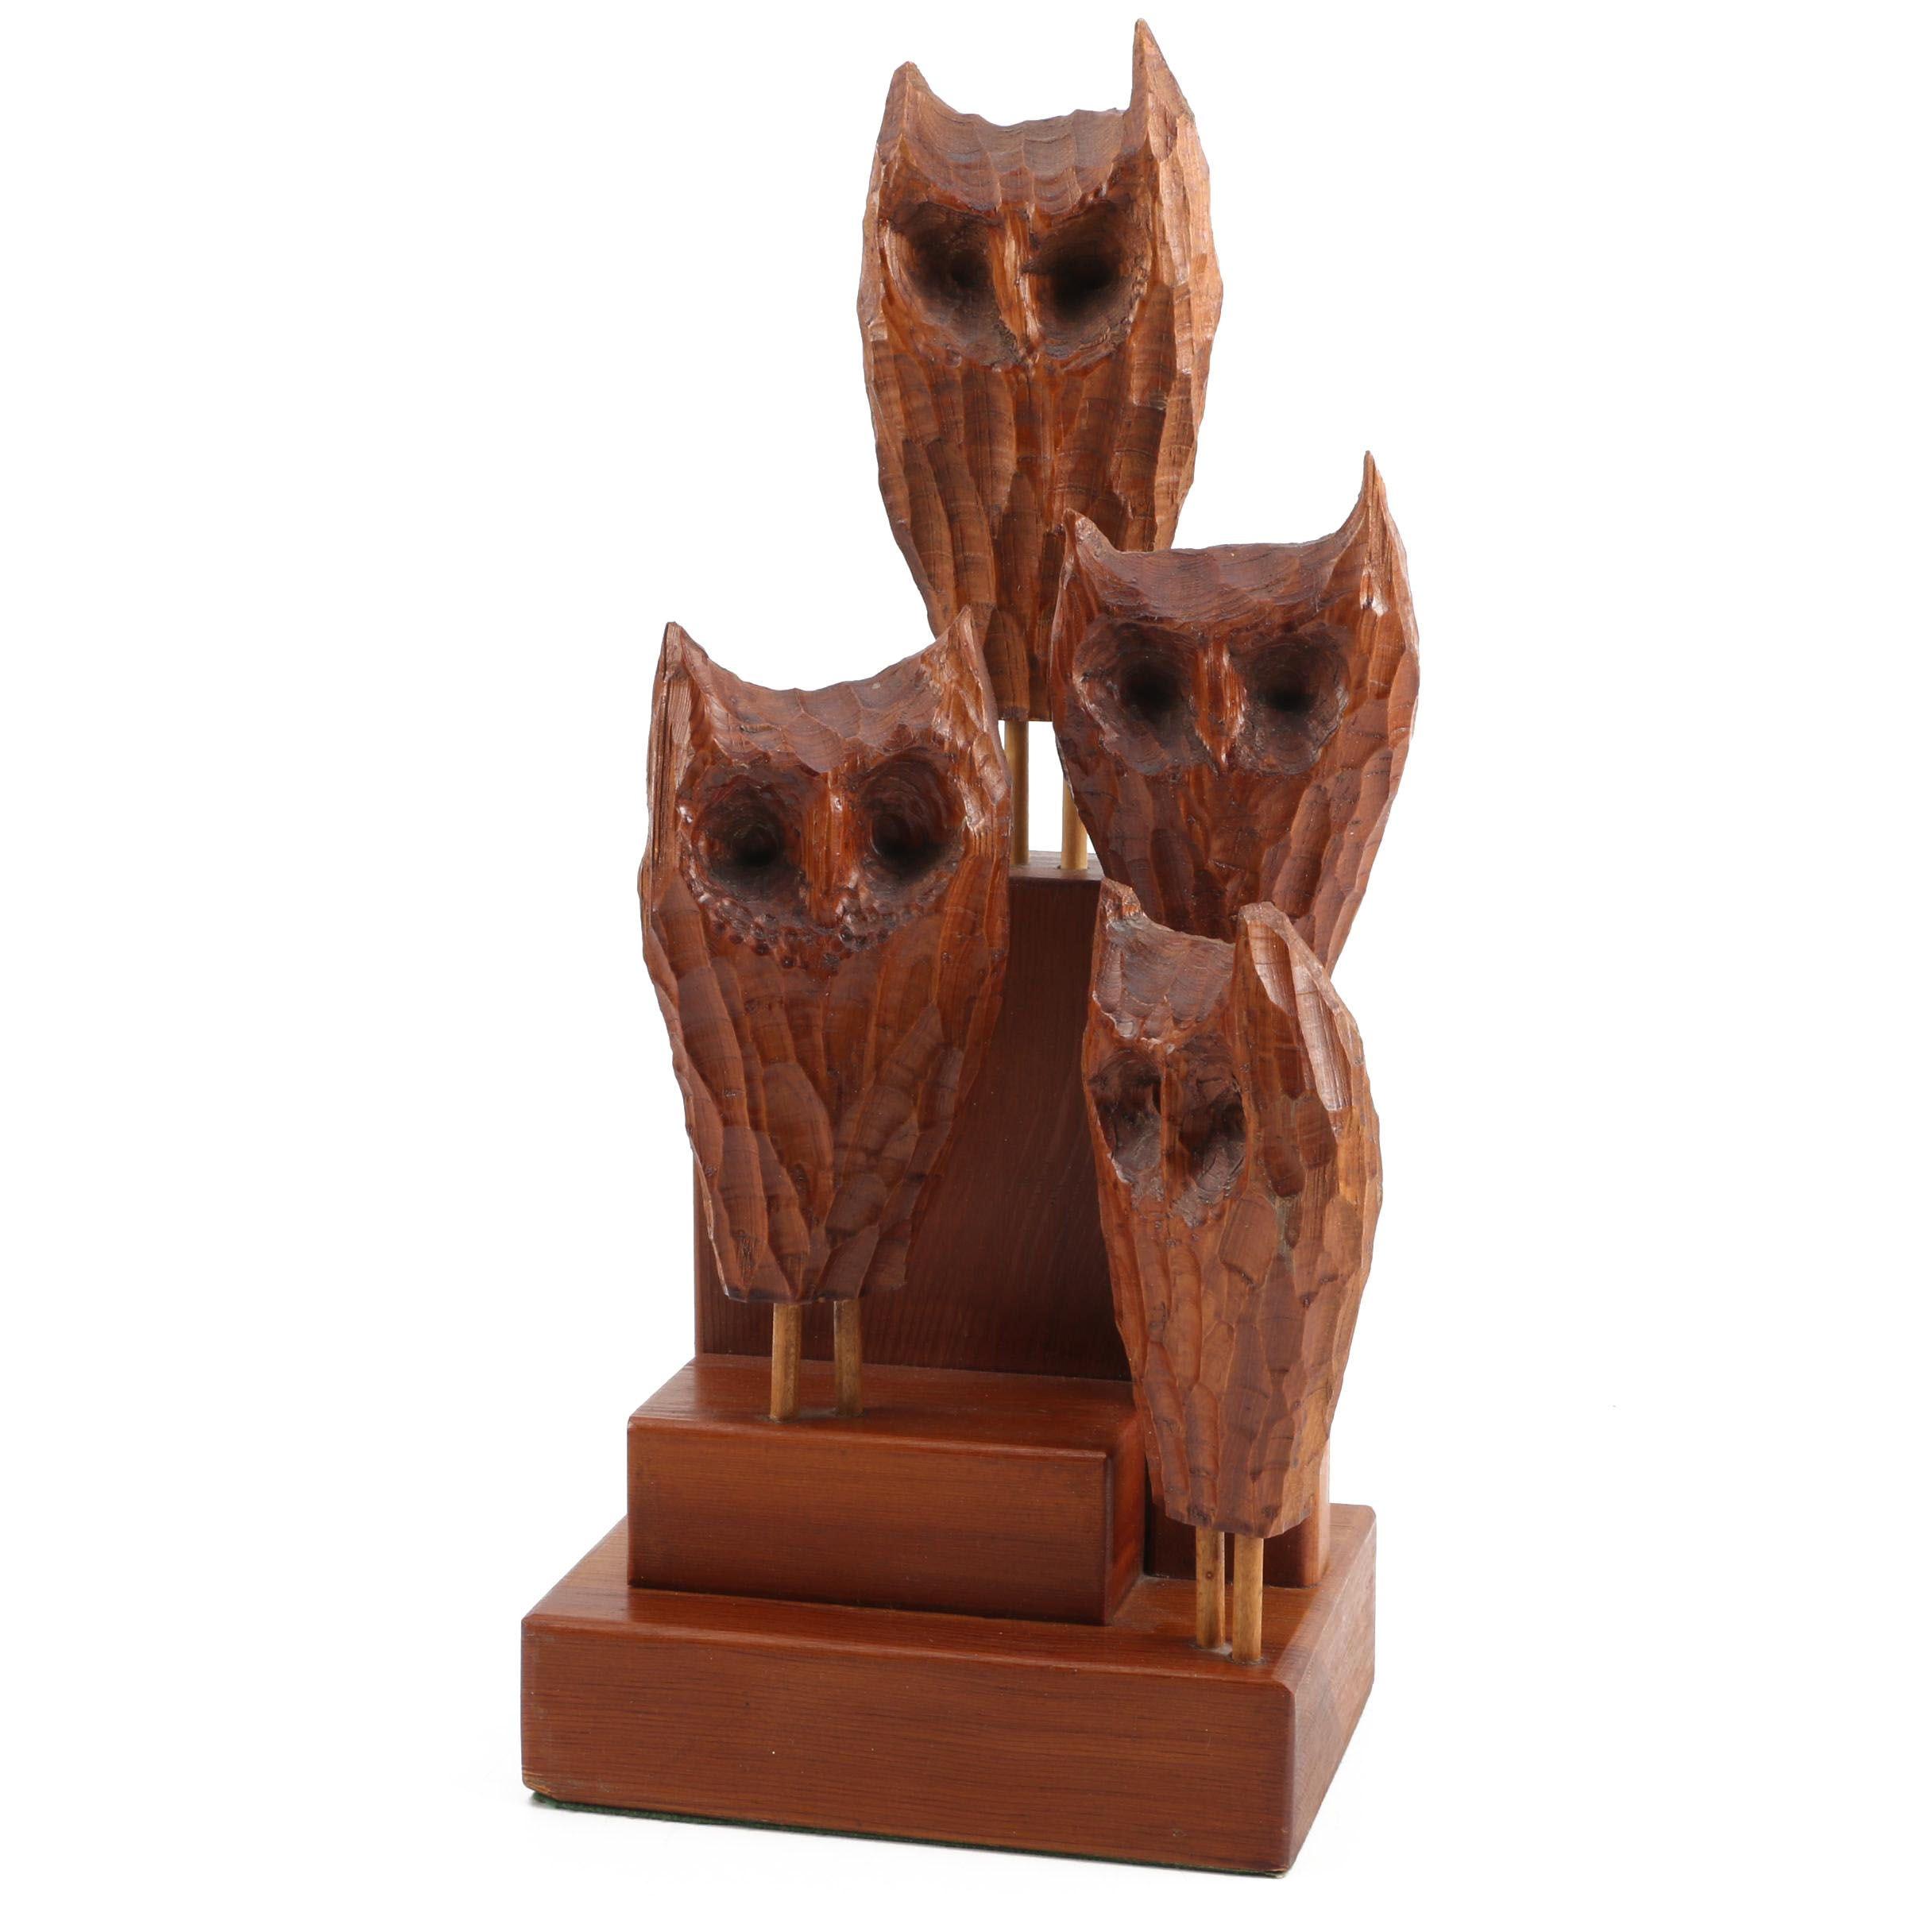 Mid Century Qulleson Wooden Sculpture of Owls